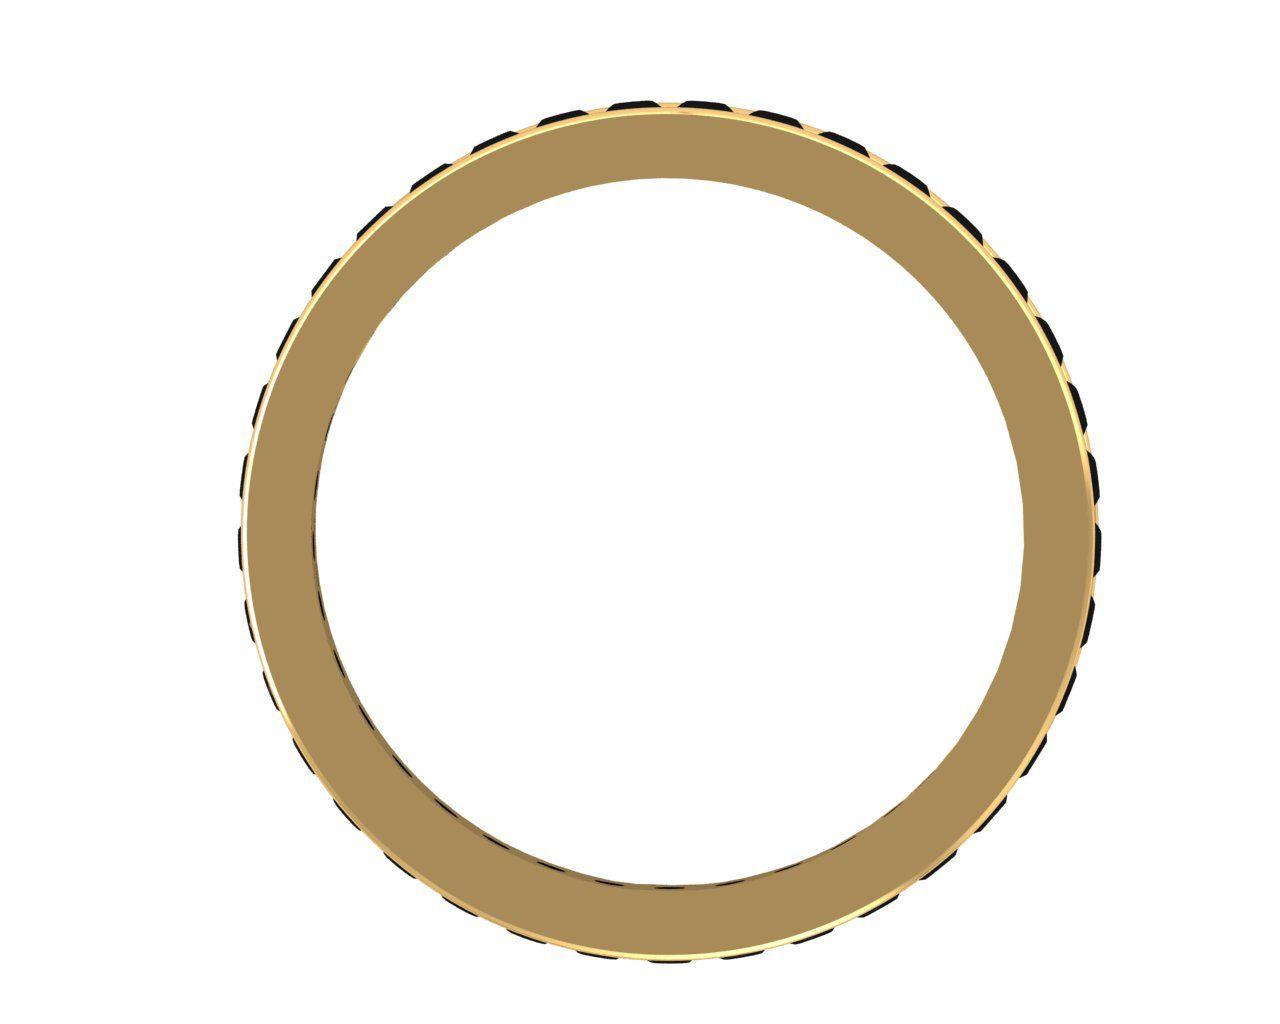 Jewelmantra 22kt Gold Ring